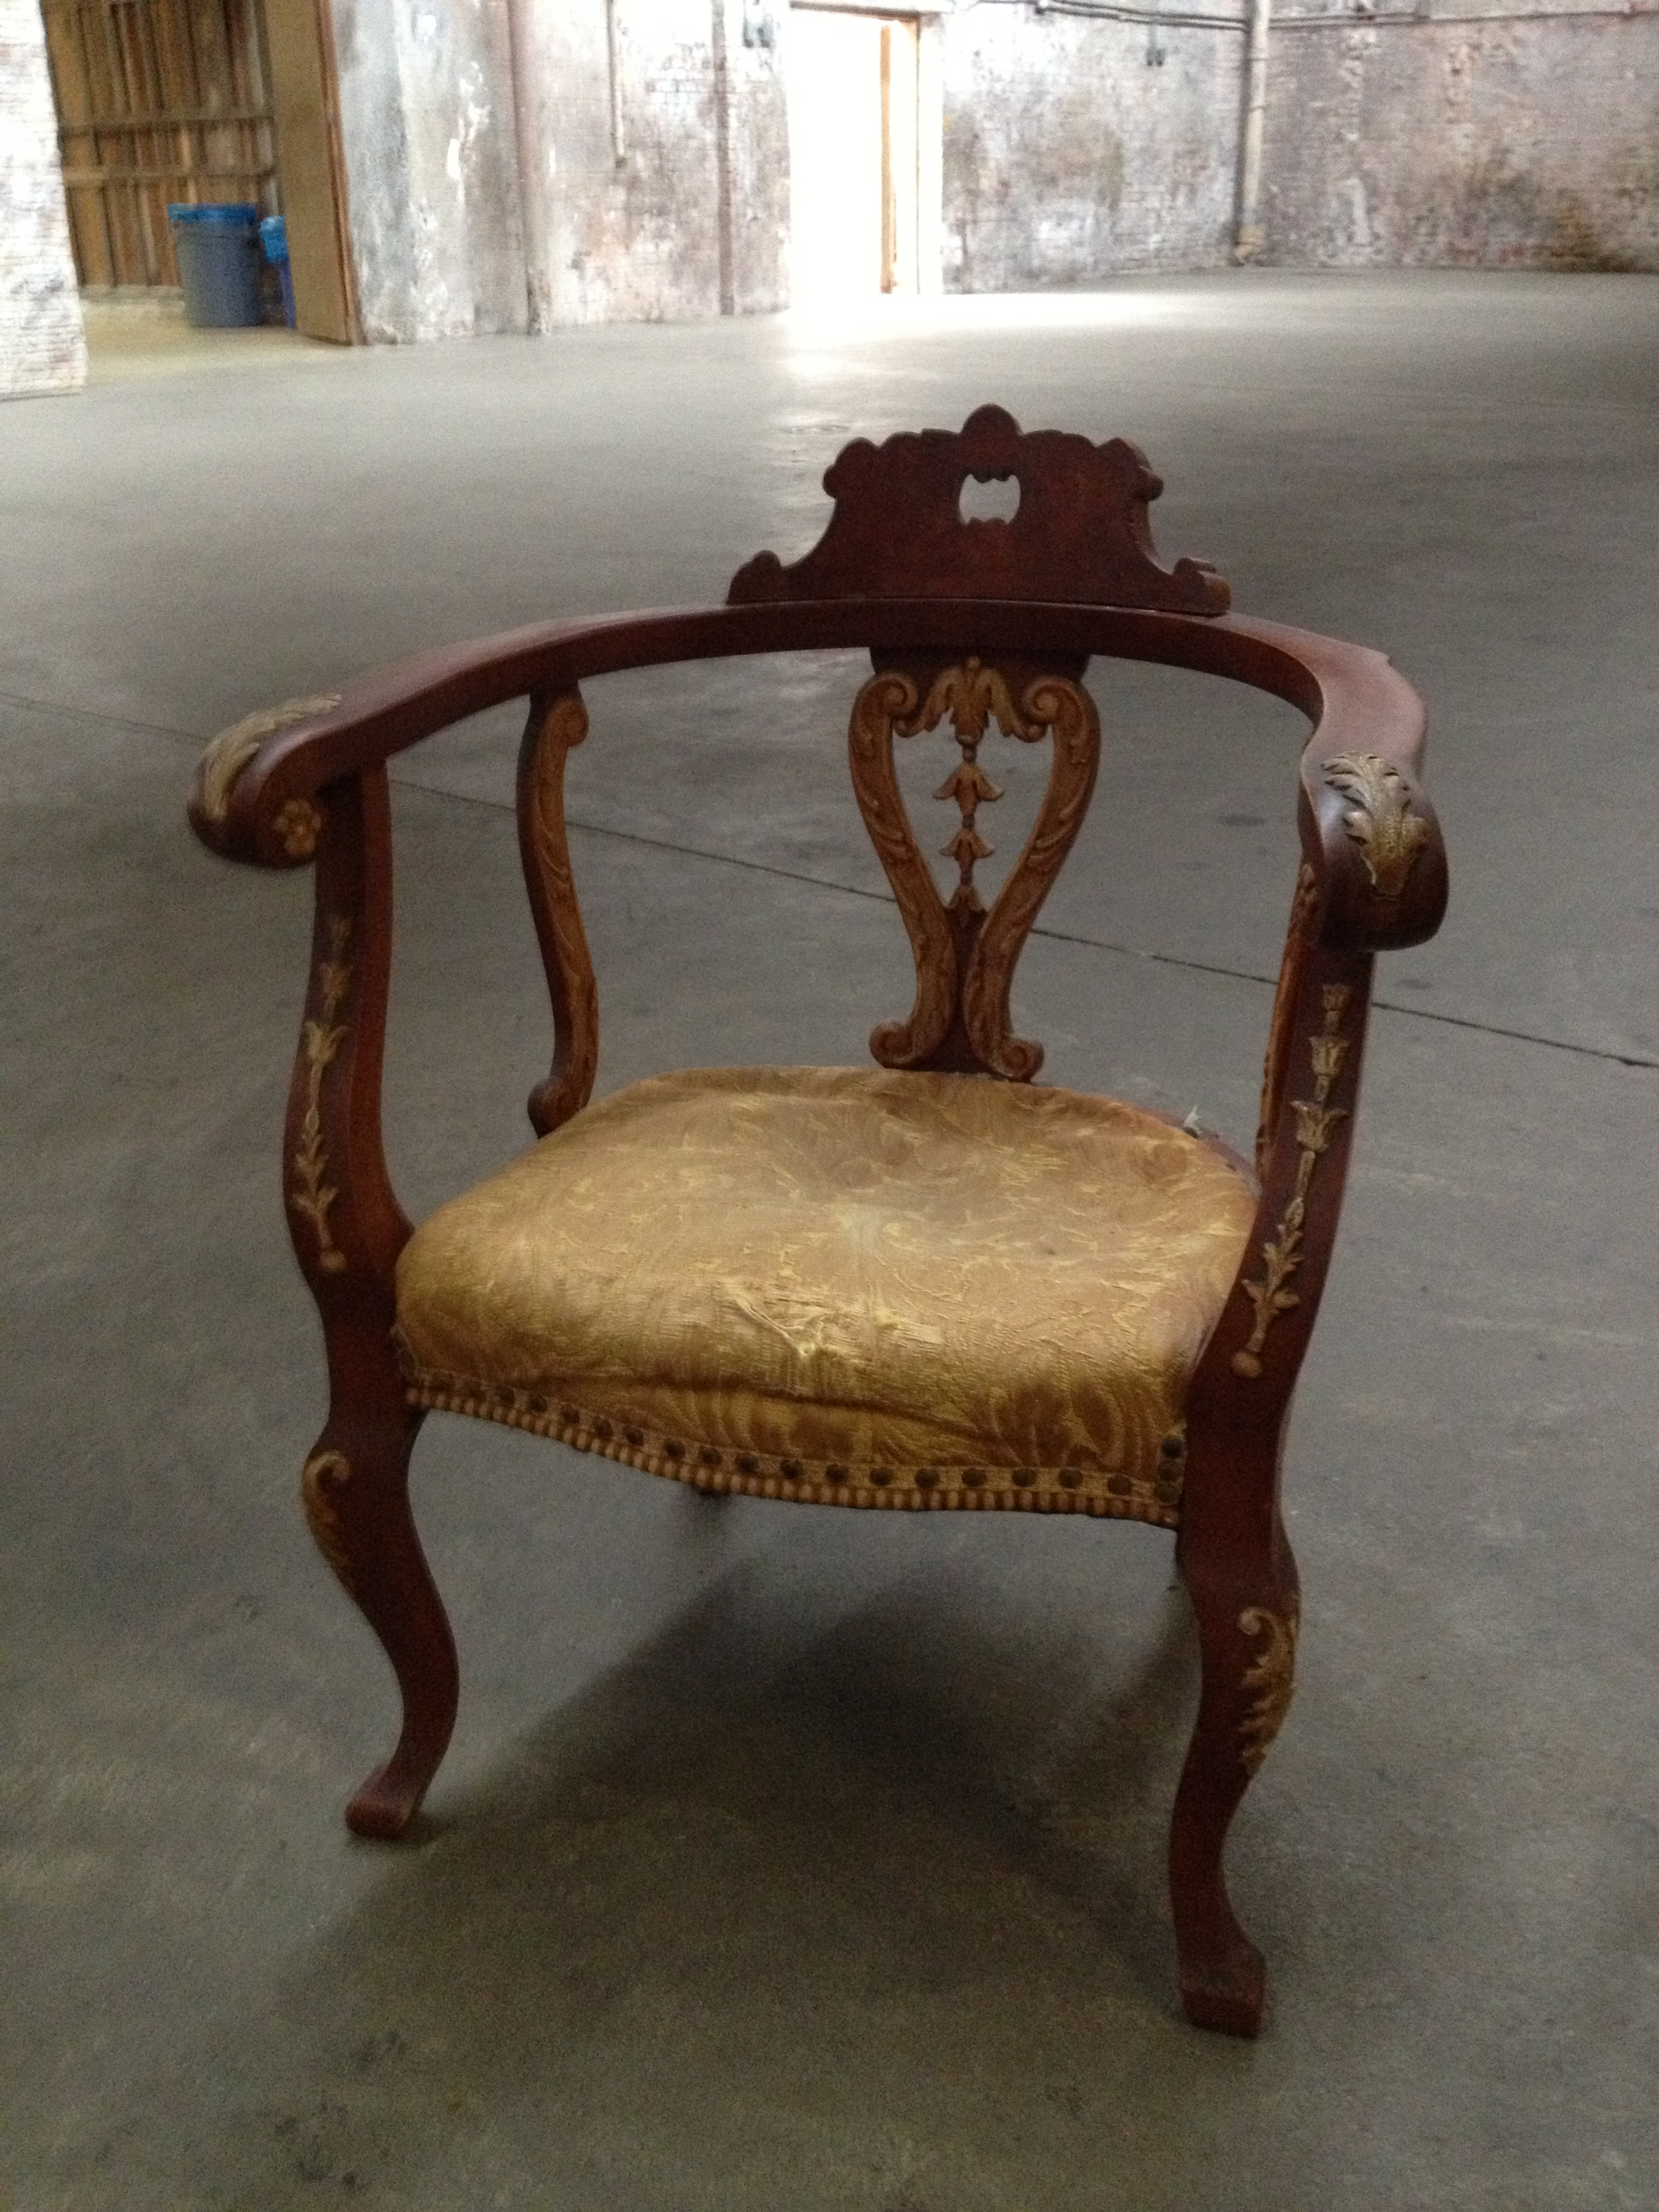 Antique Yellow Seat Throne $75